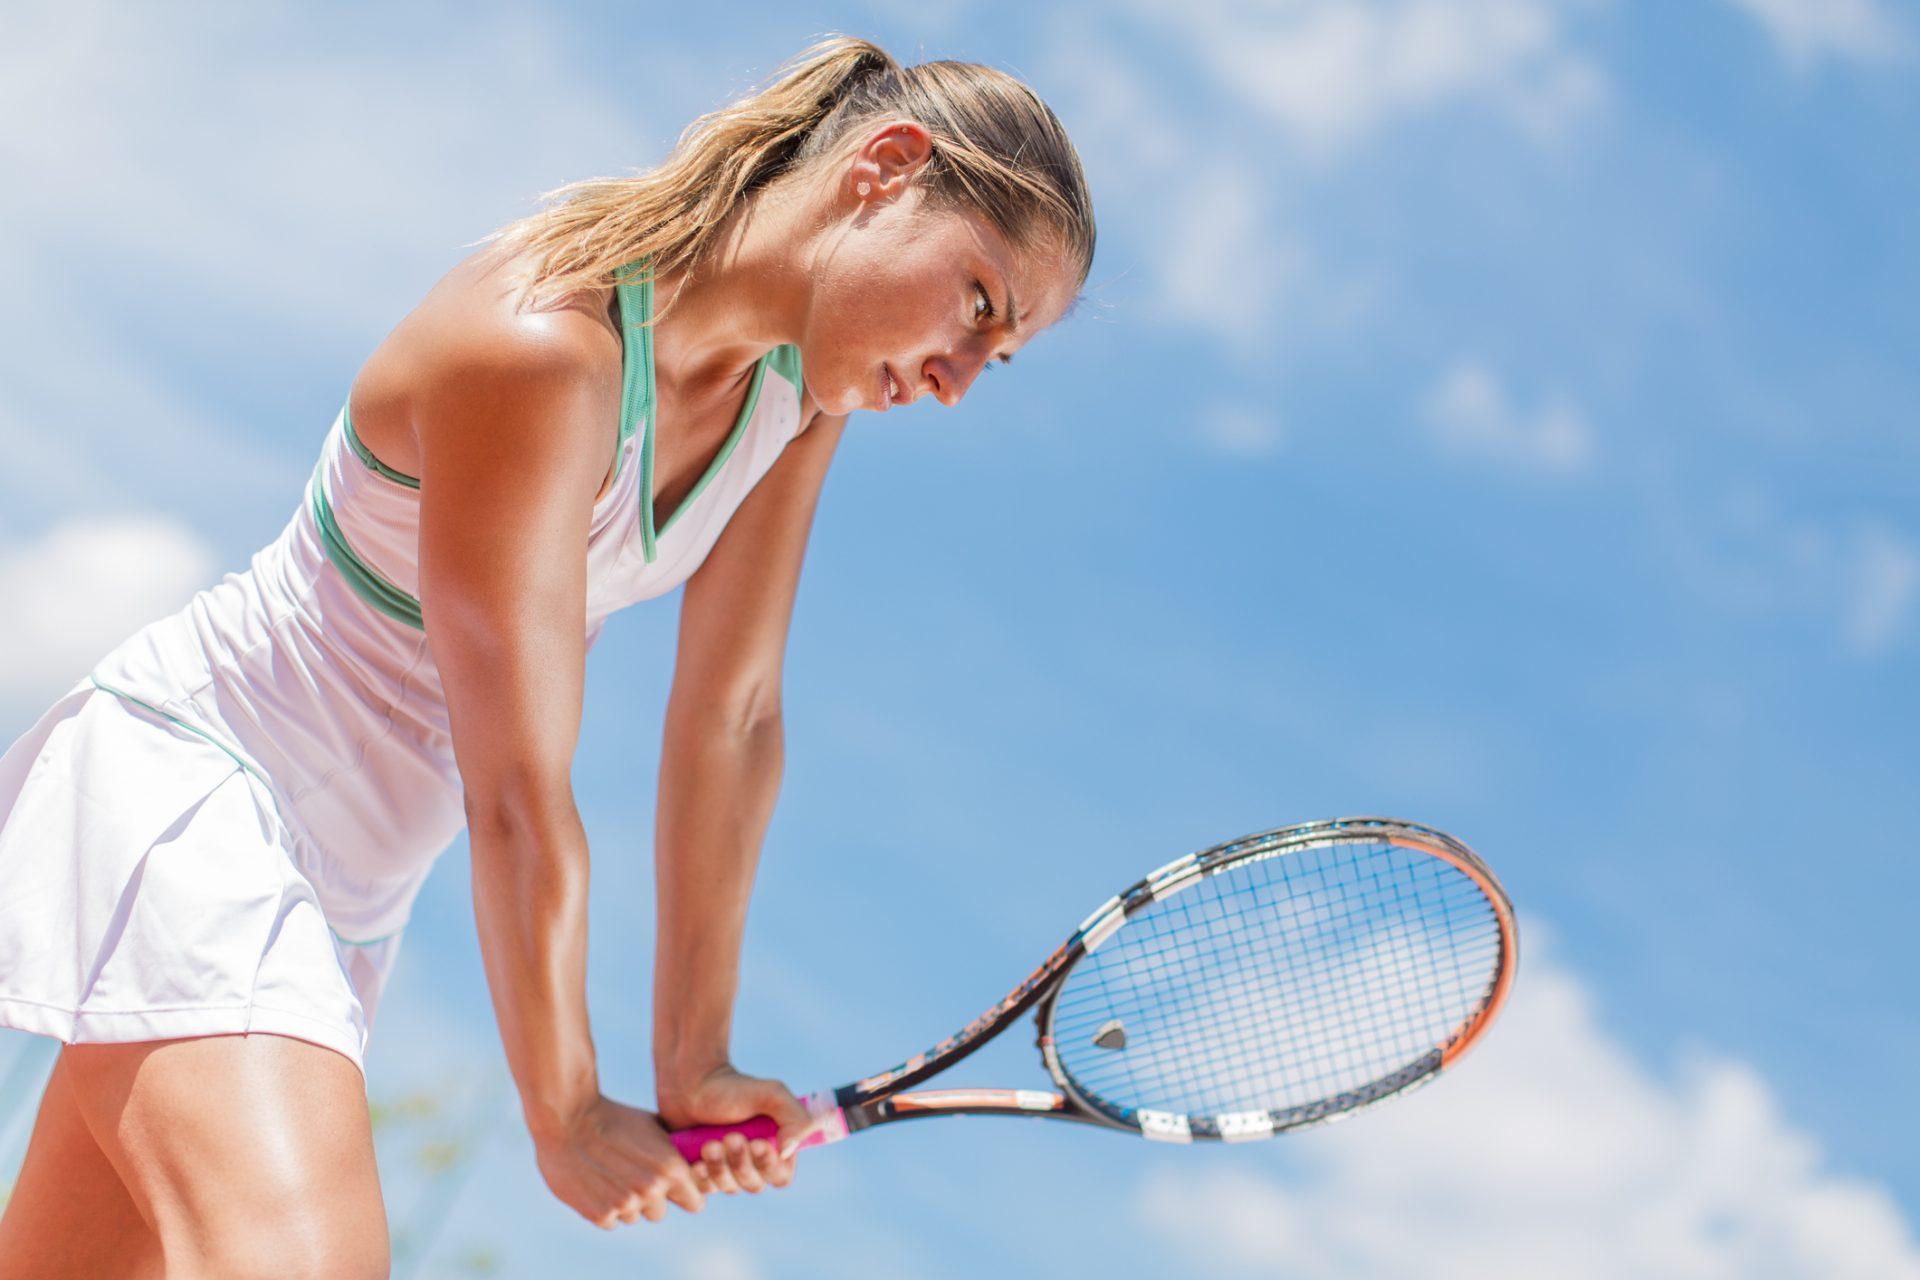 tenniswelt.biz